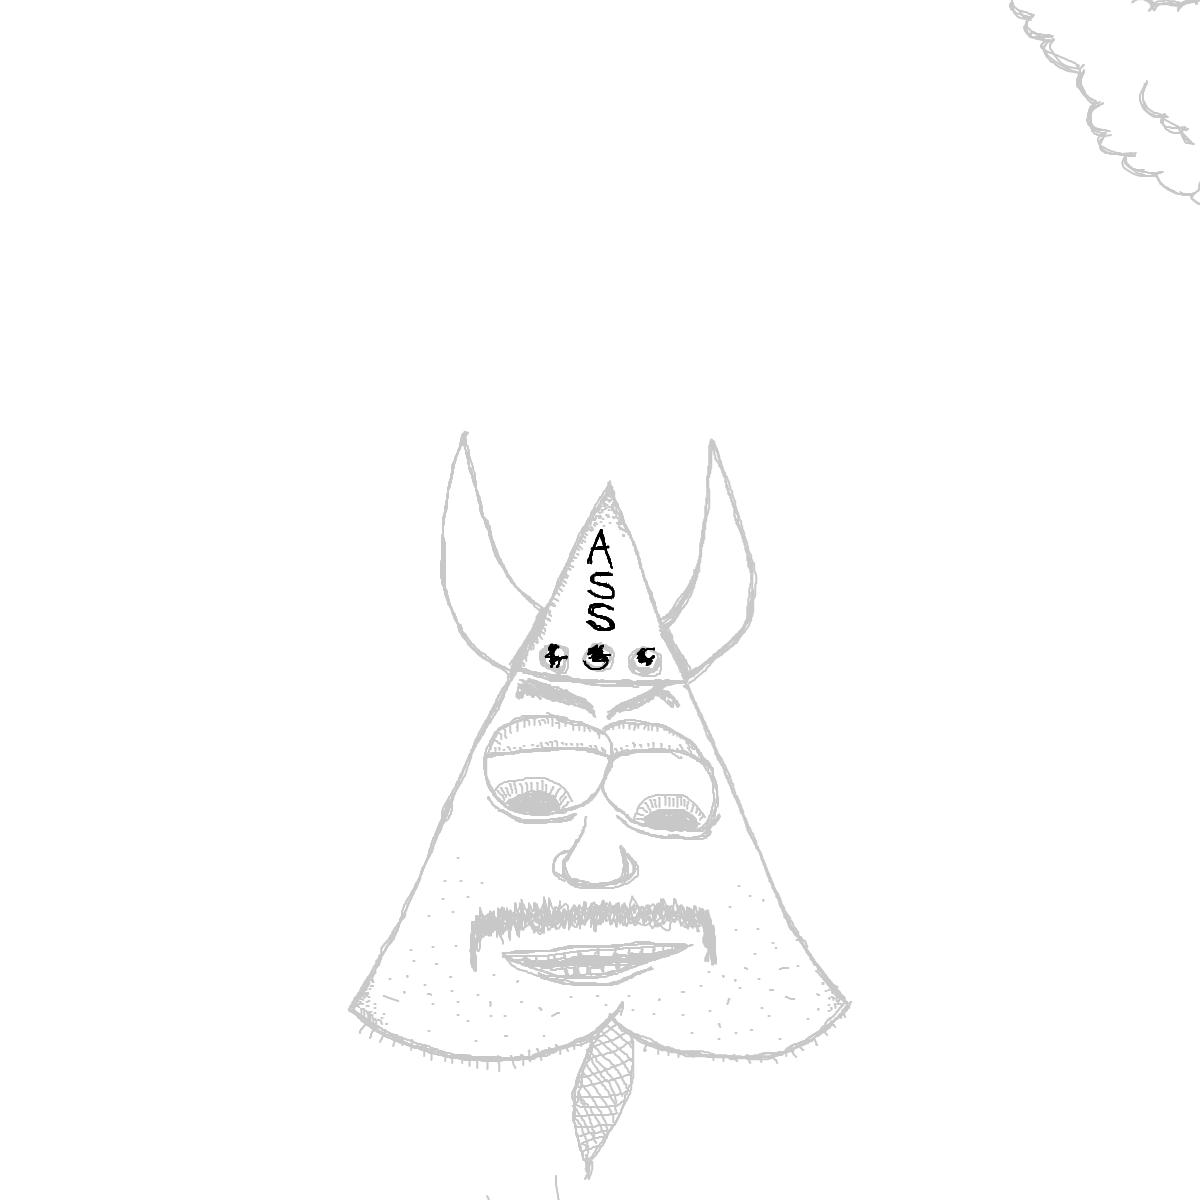 BAAAM drawing#2989 lat:43.3357391357421900lng: -1.9728734493255615